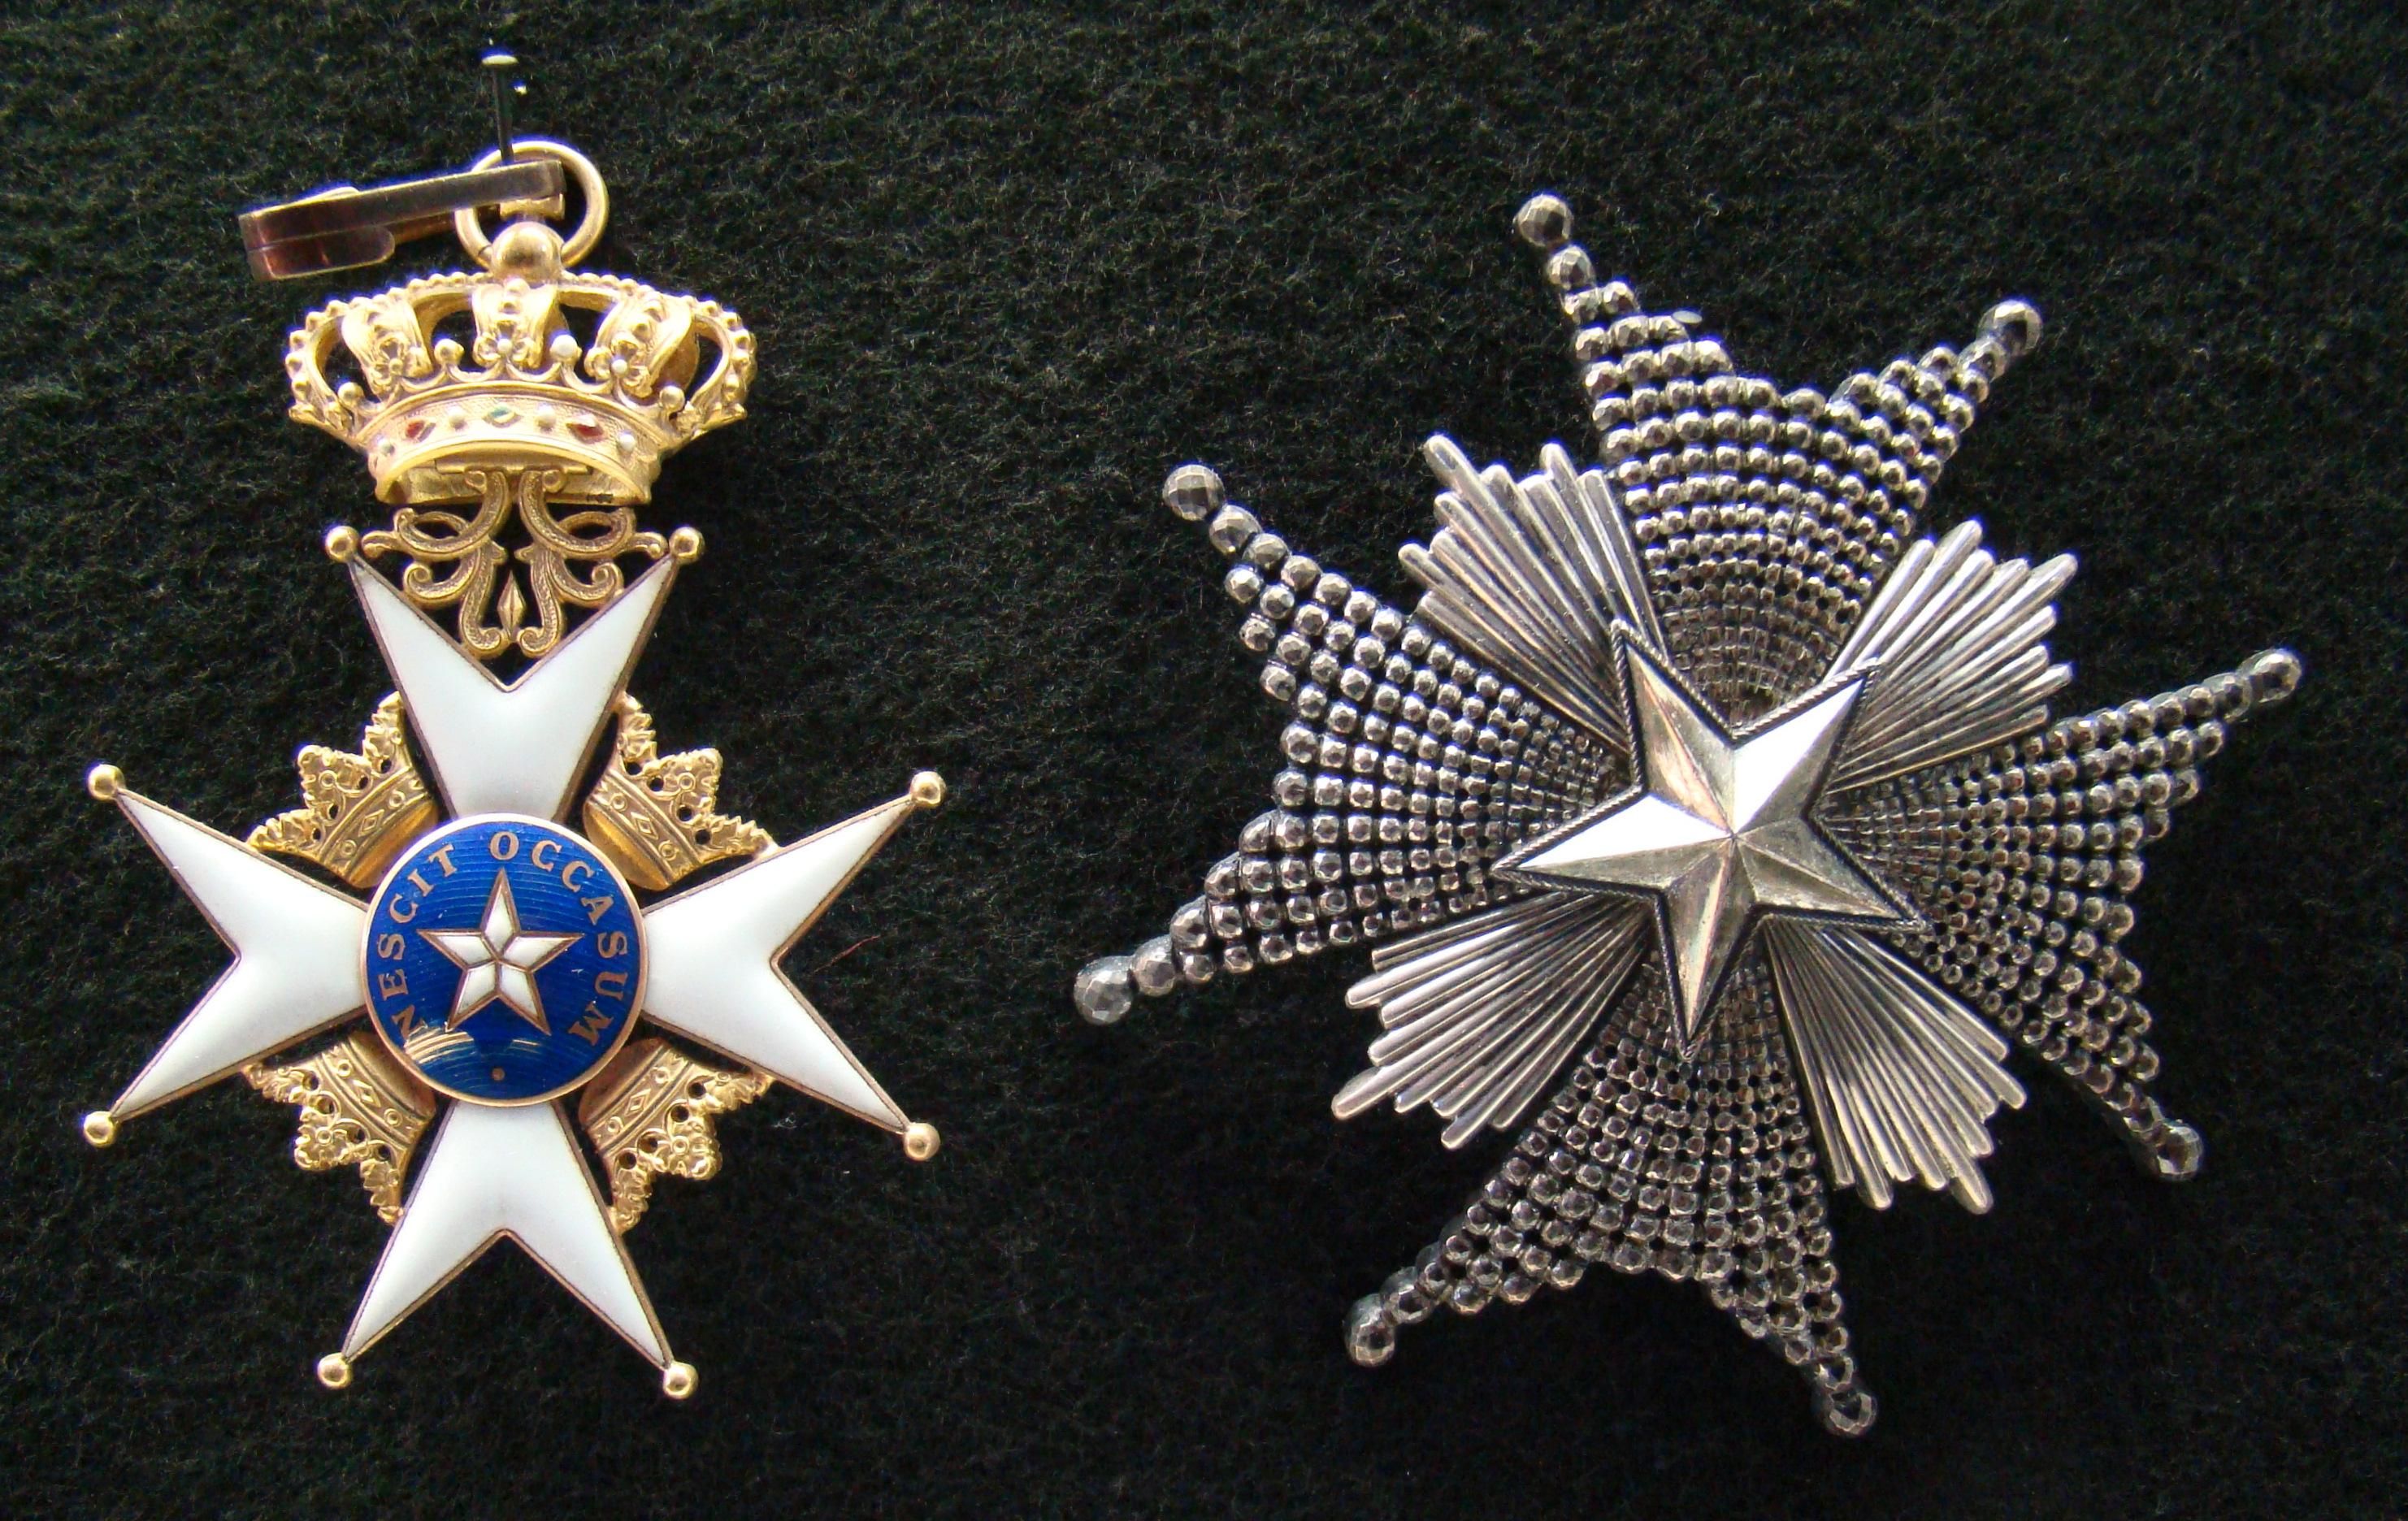 SFa | Боевые награды армии SF Sweden_Order_of_the_North_Star